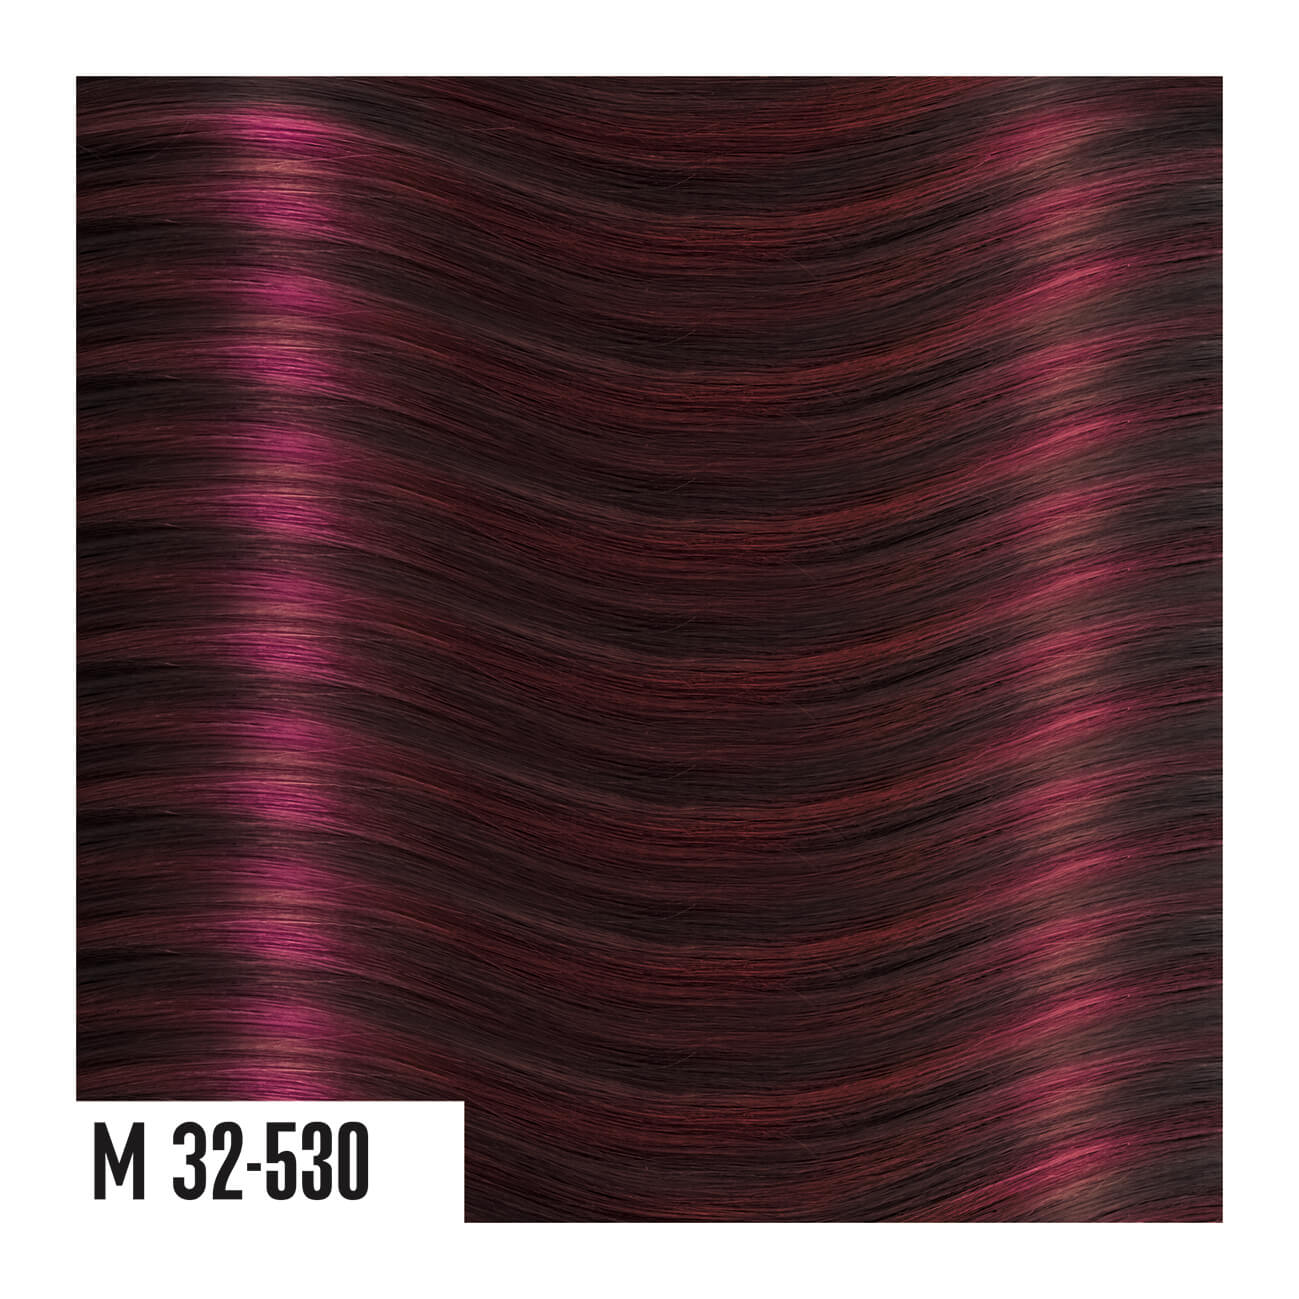 M32-530